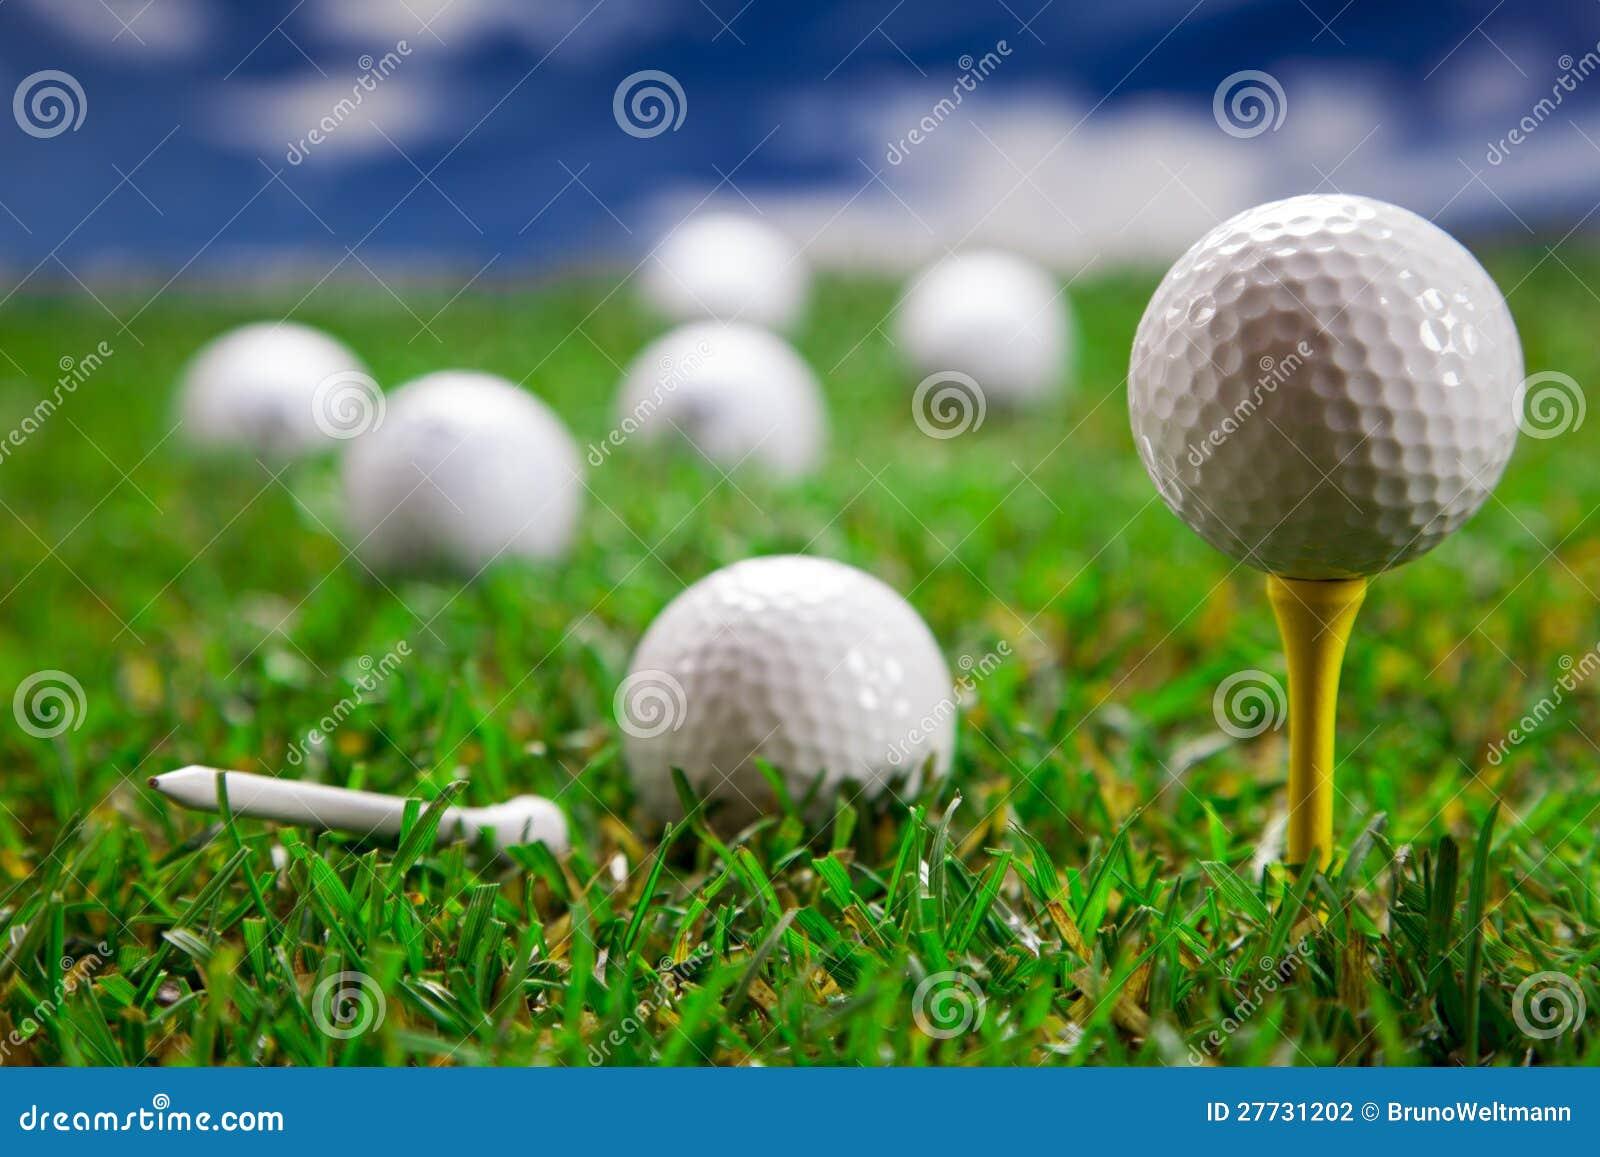 Golfballnahaufnahme